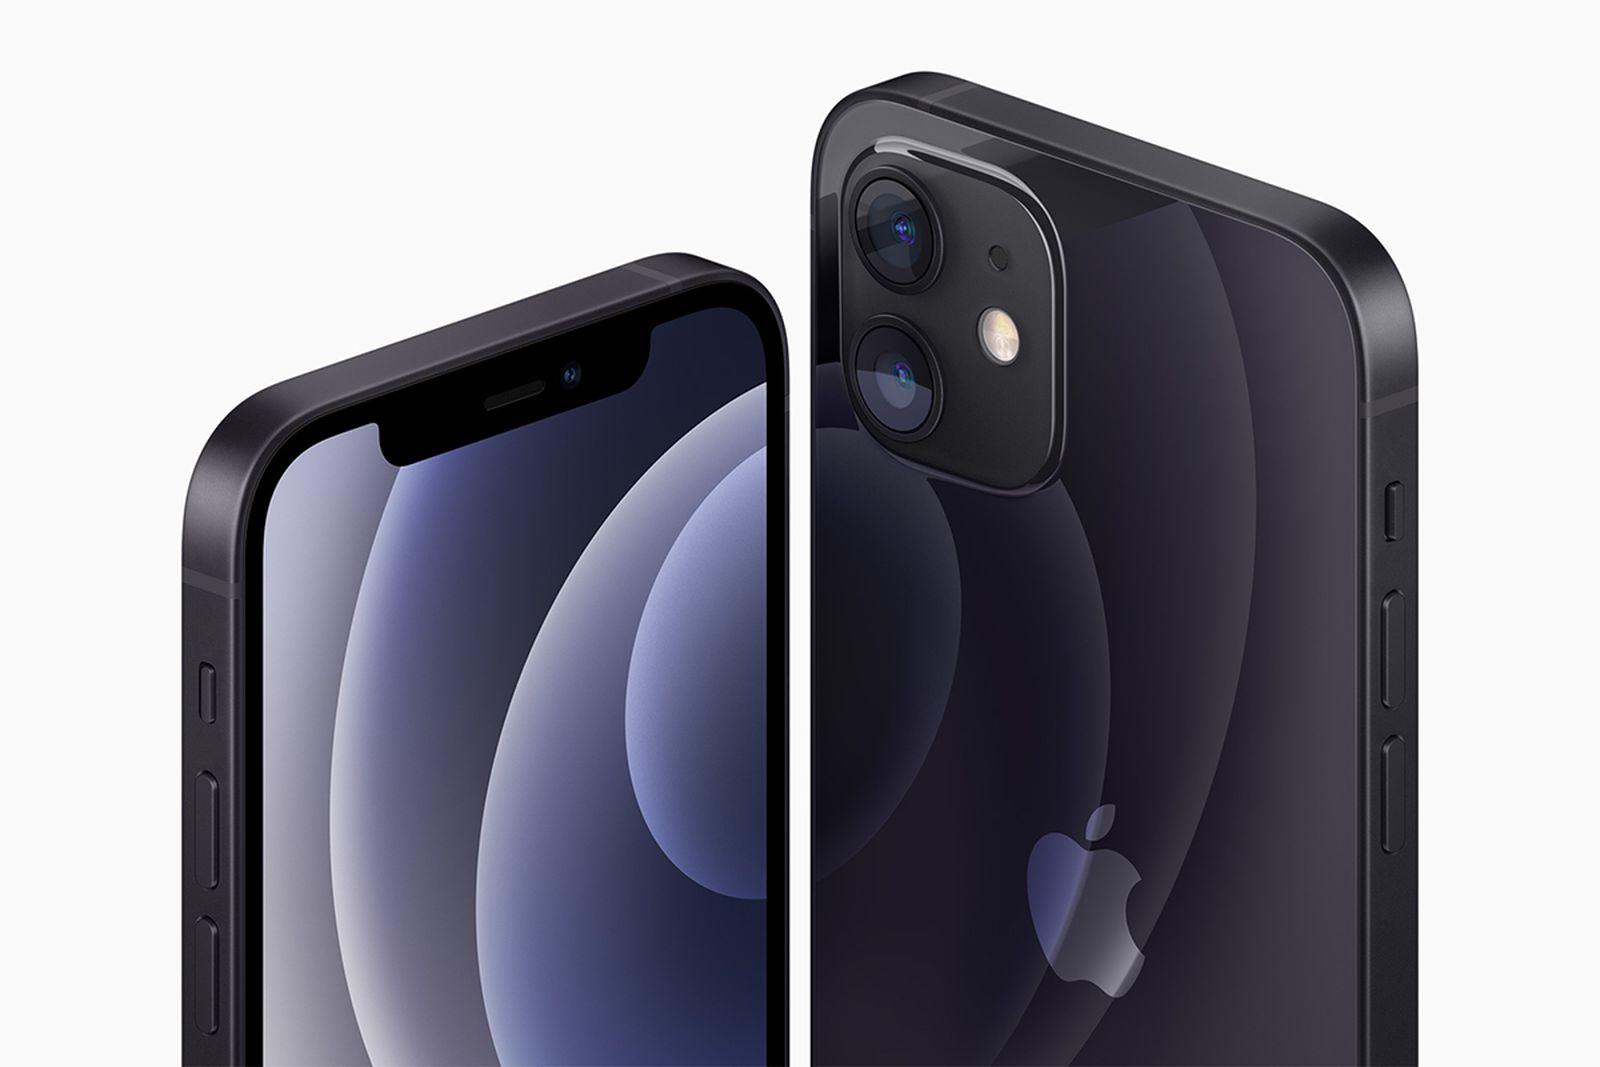 apple-iphone-12-release-date-price-07